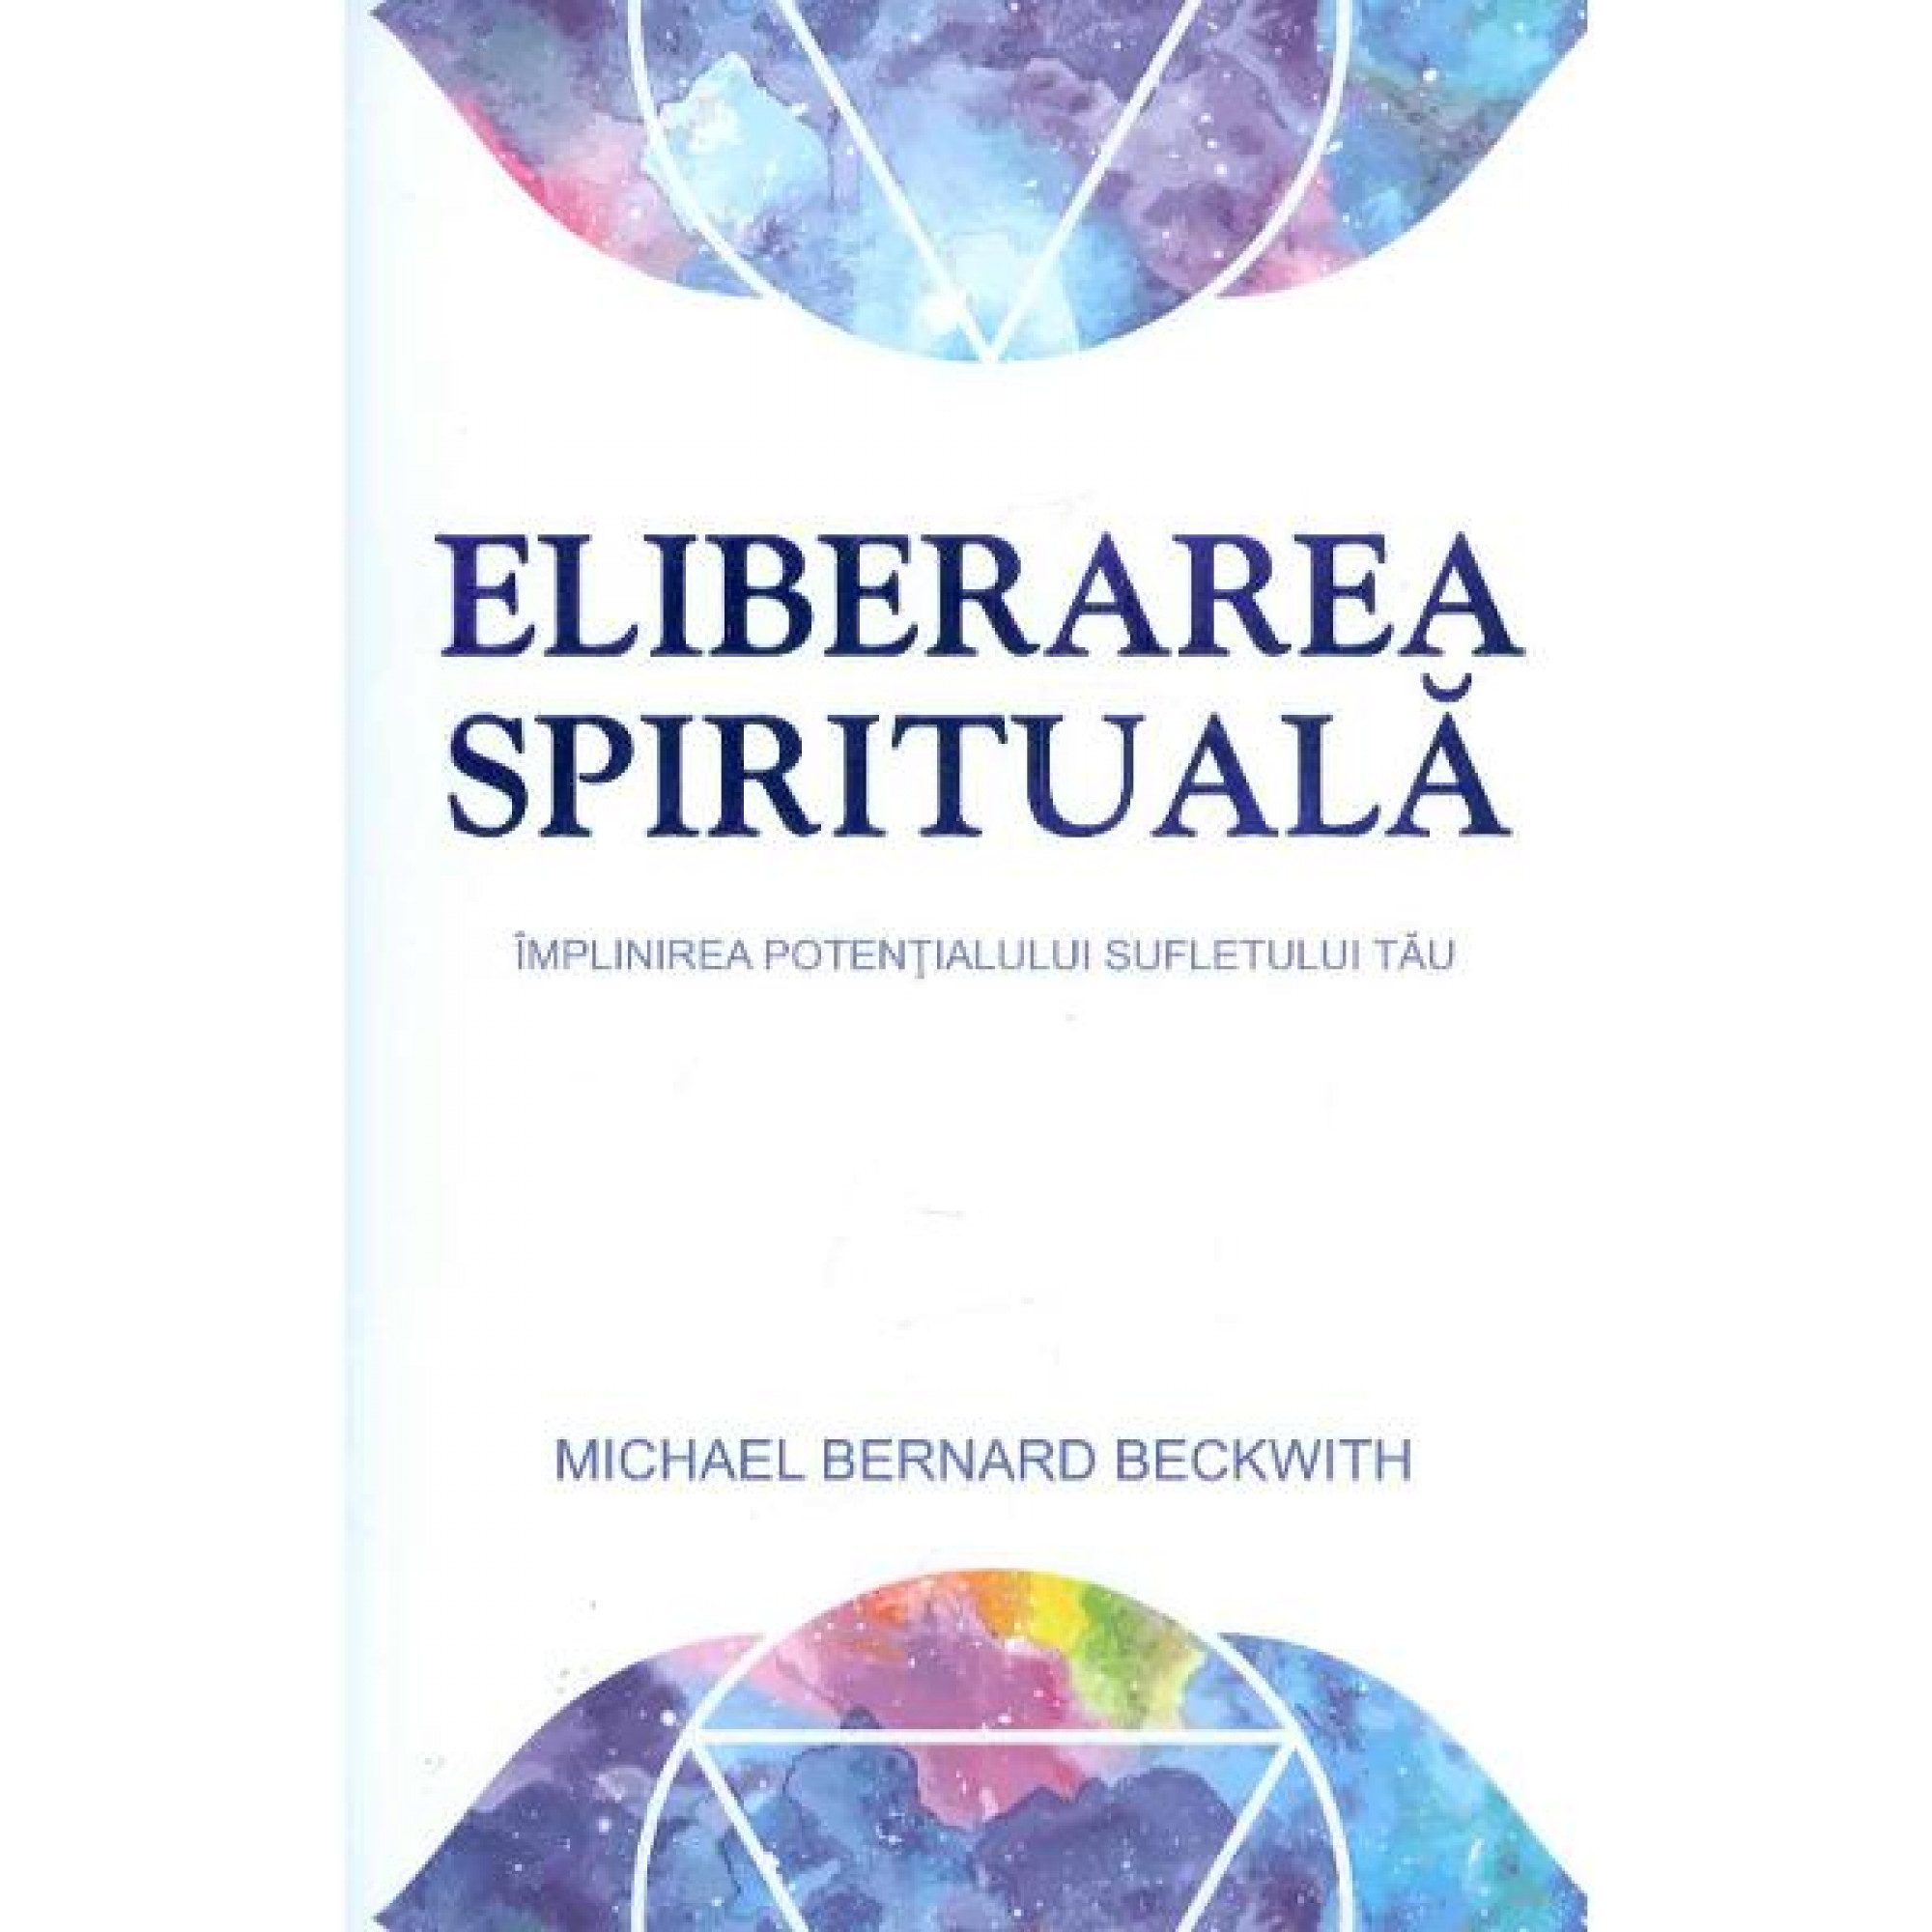 Eliberarea spirituală; Michael Bernard Beckwith